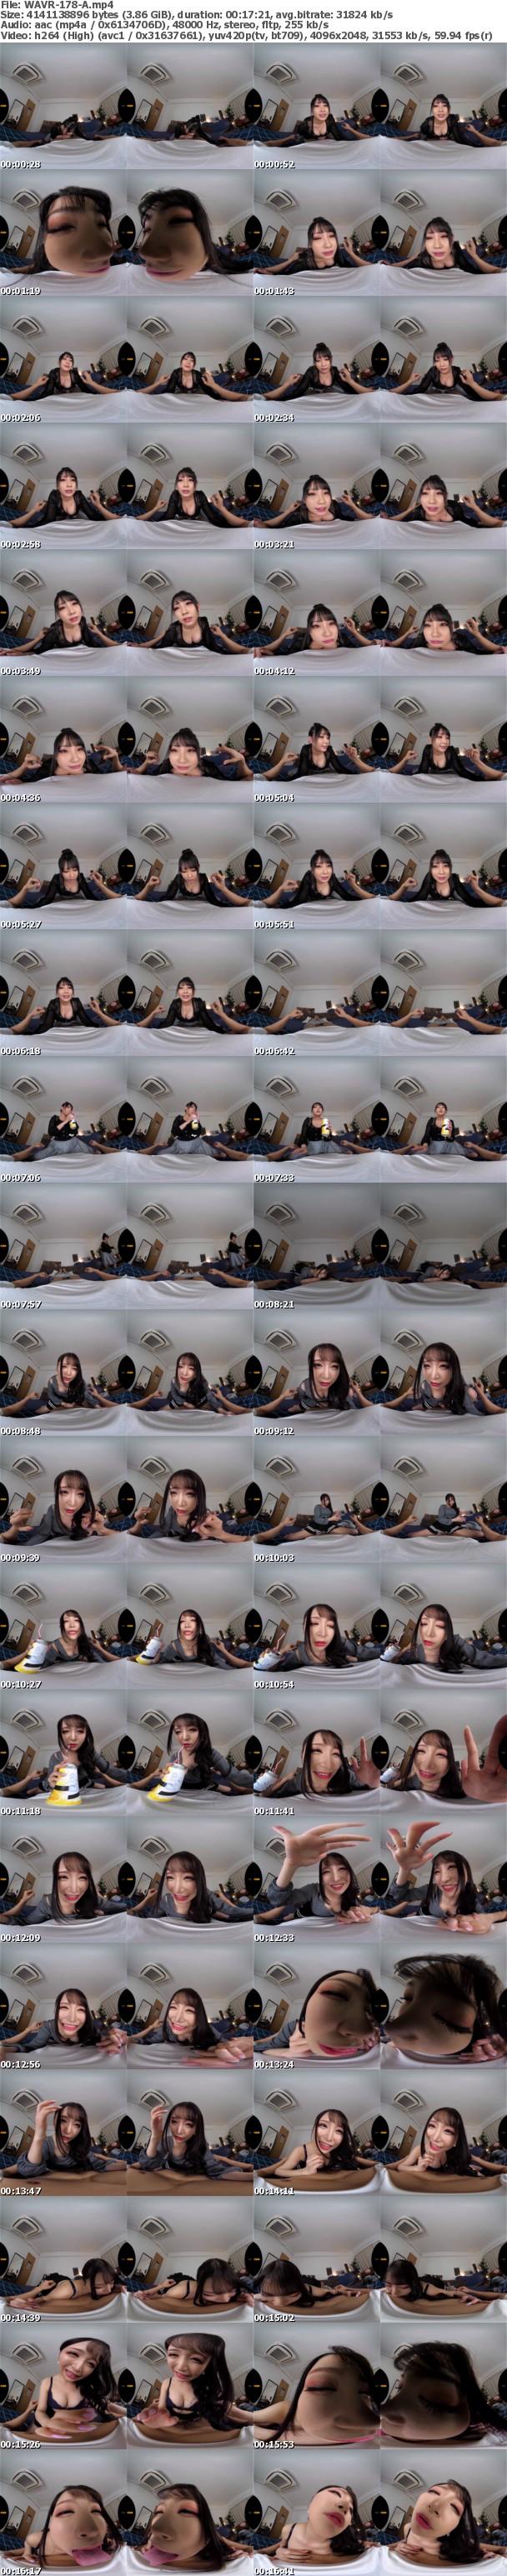 (VR) WAVR-178 【閲覧注意】W地雷系女子とひとつ屋根の下で三角関係になったボク【修羅場VR】